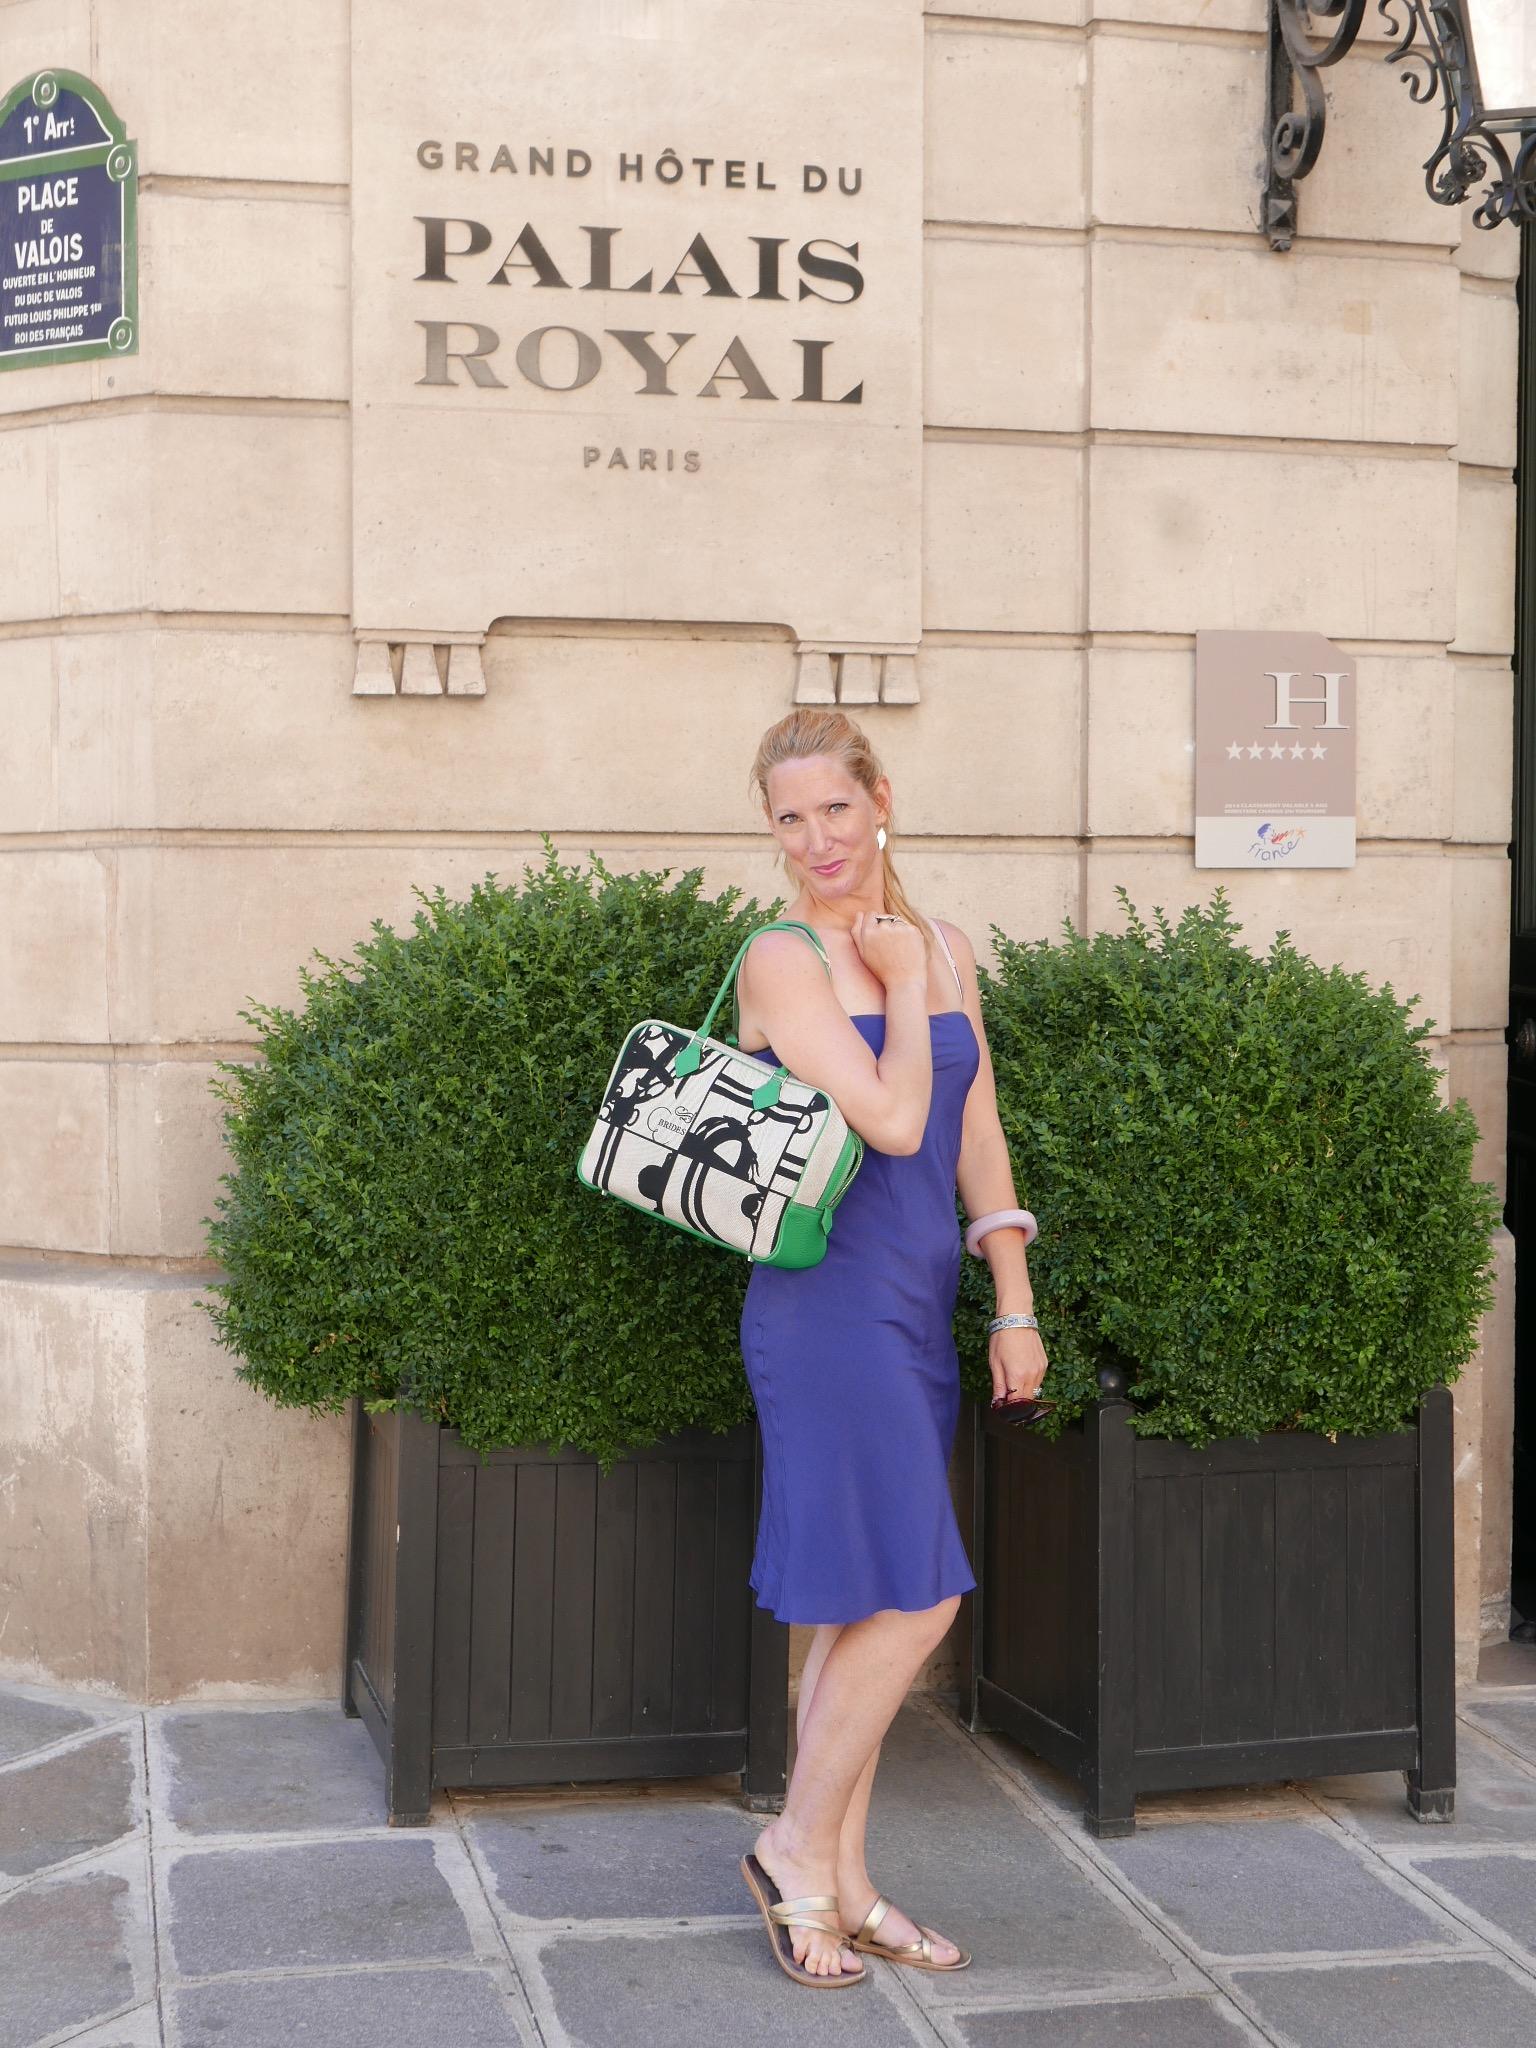 breakfast at le grand hotel du palais royal pr te moi paris. Black Bedroom Furniture Sets. Home Design Ideas